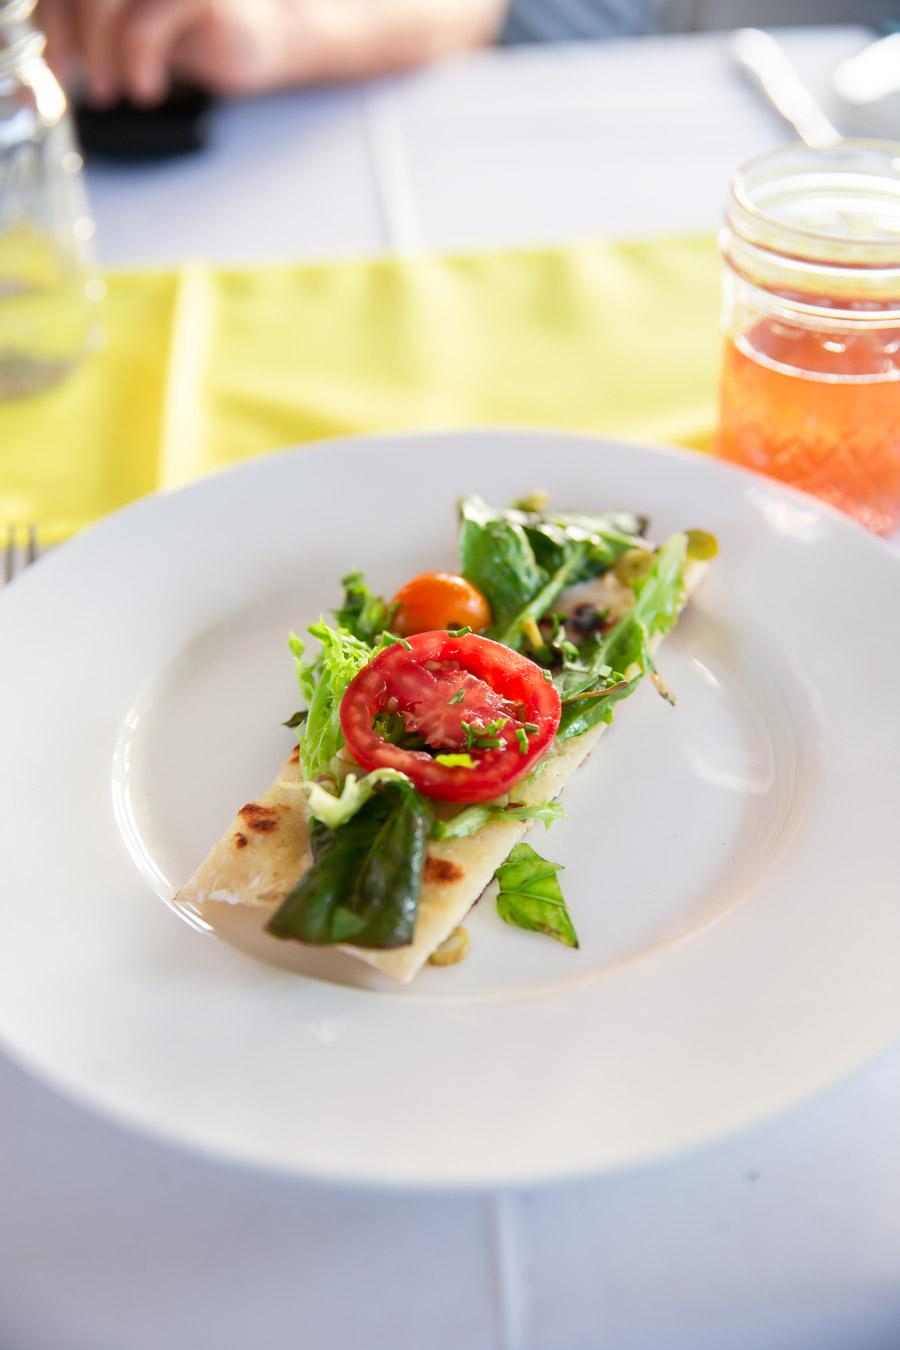 Finca-Tres-Robles-Cornucopia-Dinner-Photo-By-Nguyet-Vo-4.jpg